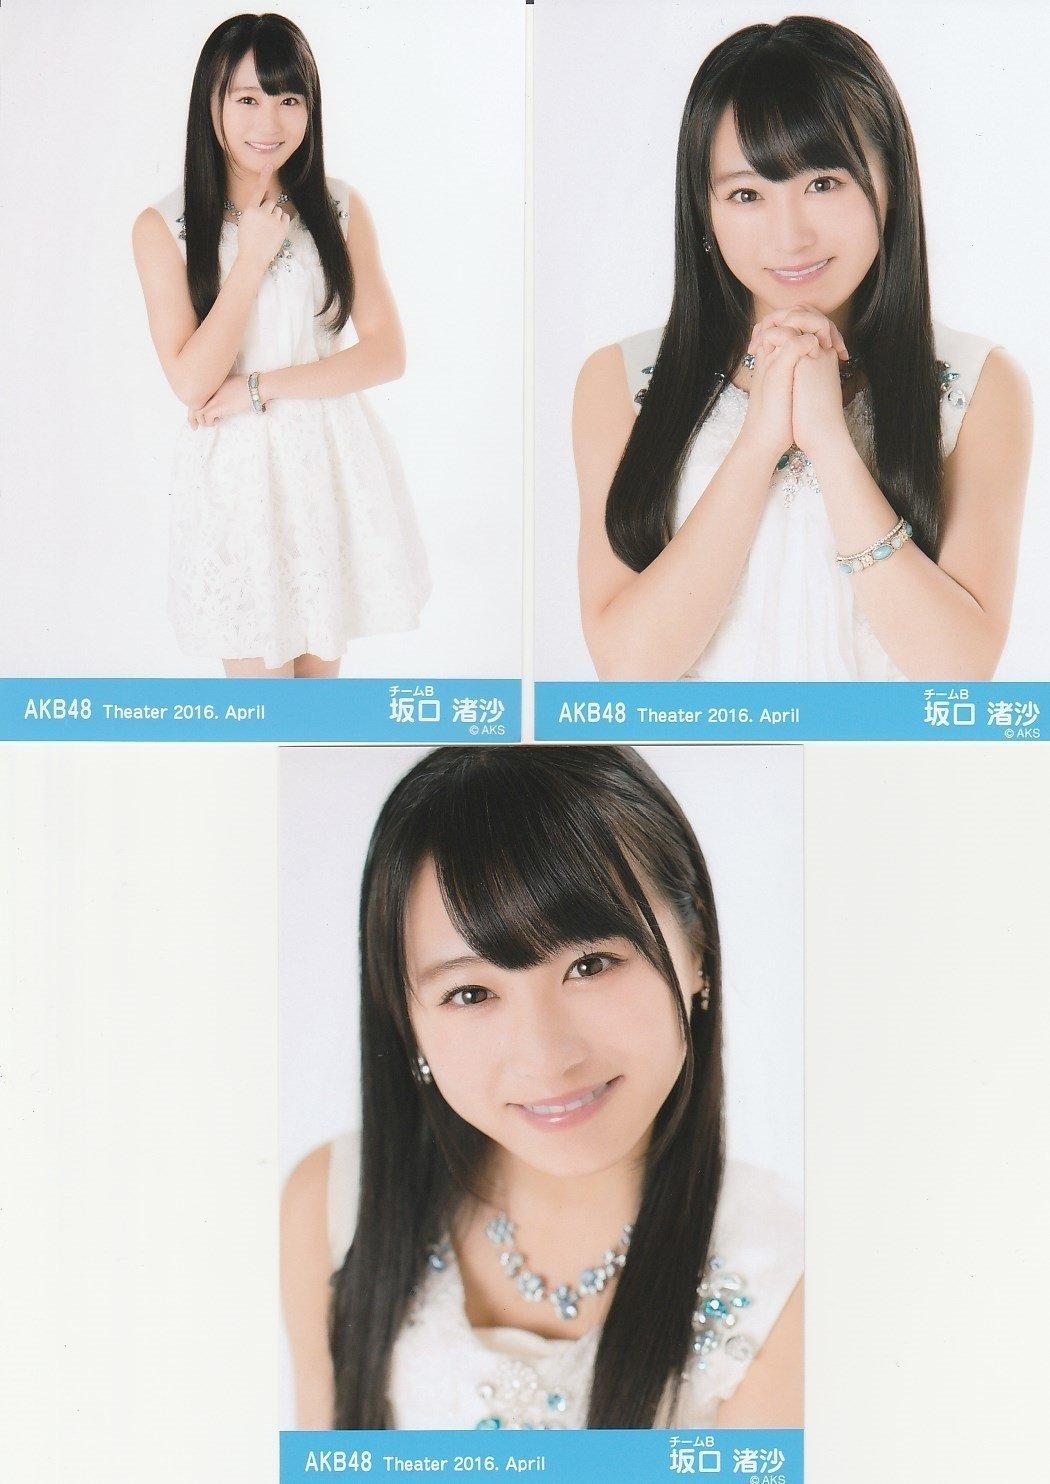 AKB48 公式生写真 Theater 2016.April 月別04月 【坂口渚沙】 3枚コンプ